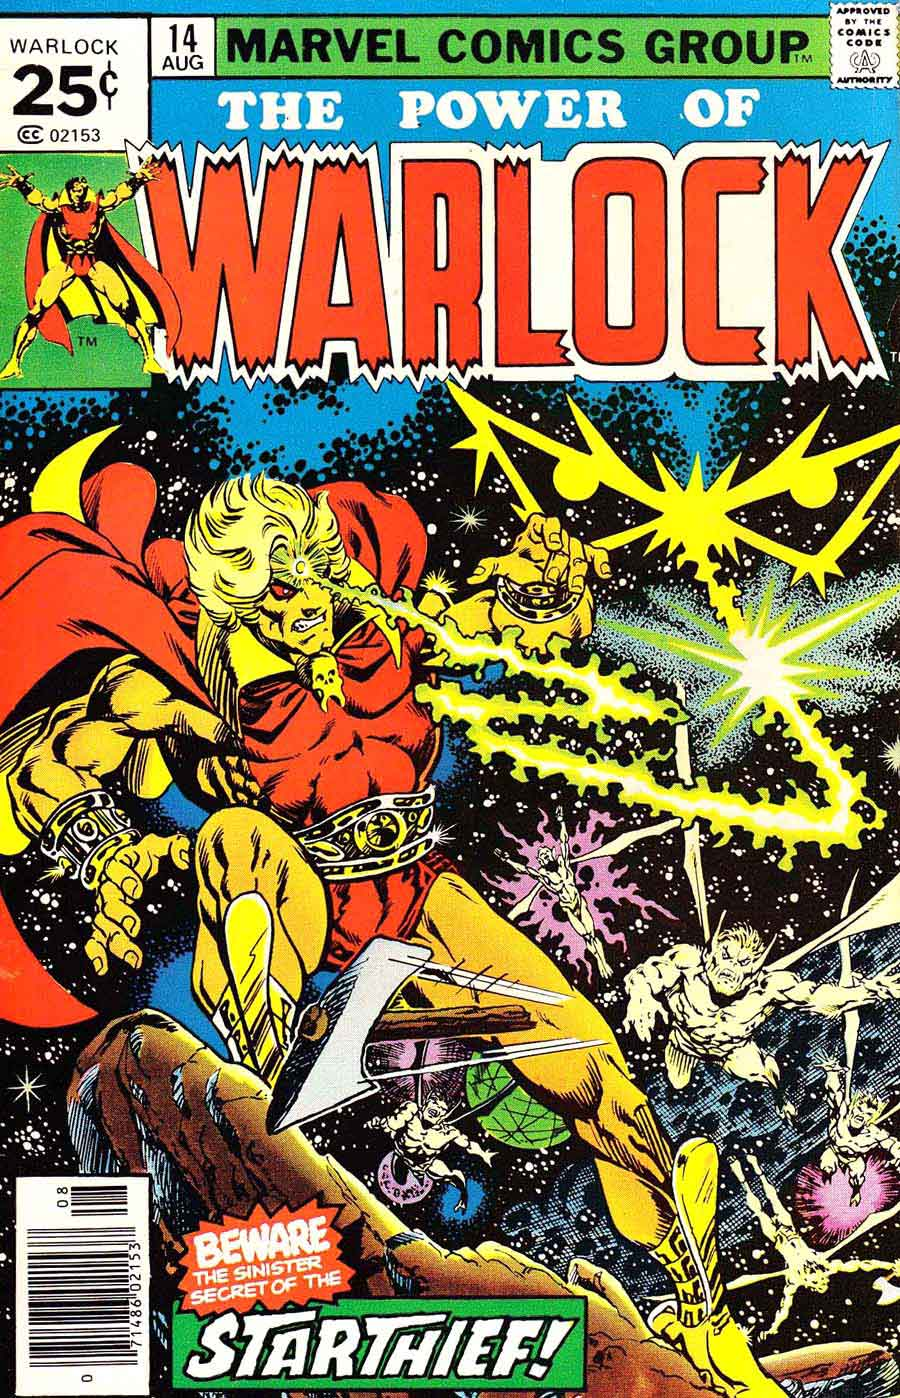 Comic Book Cover Art : Warlock jim starlin art cover pencil ink